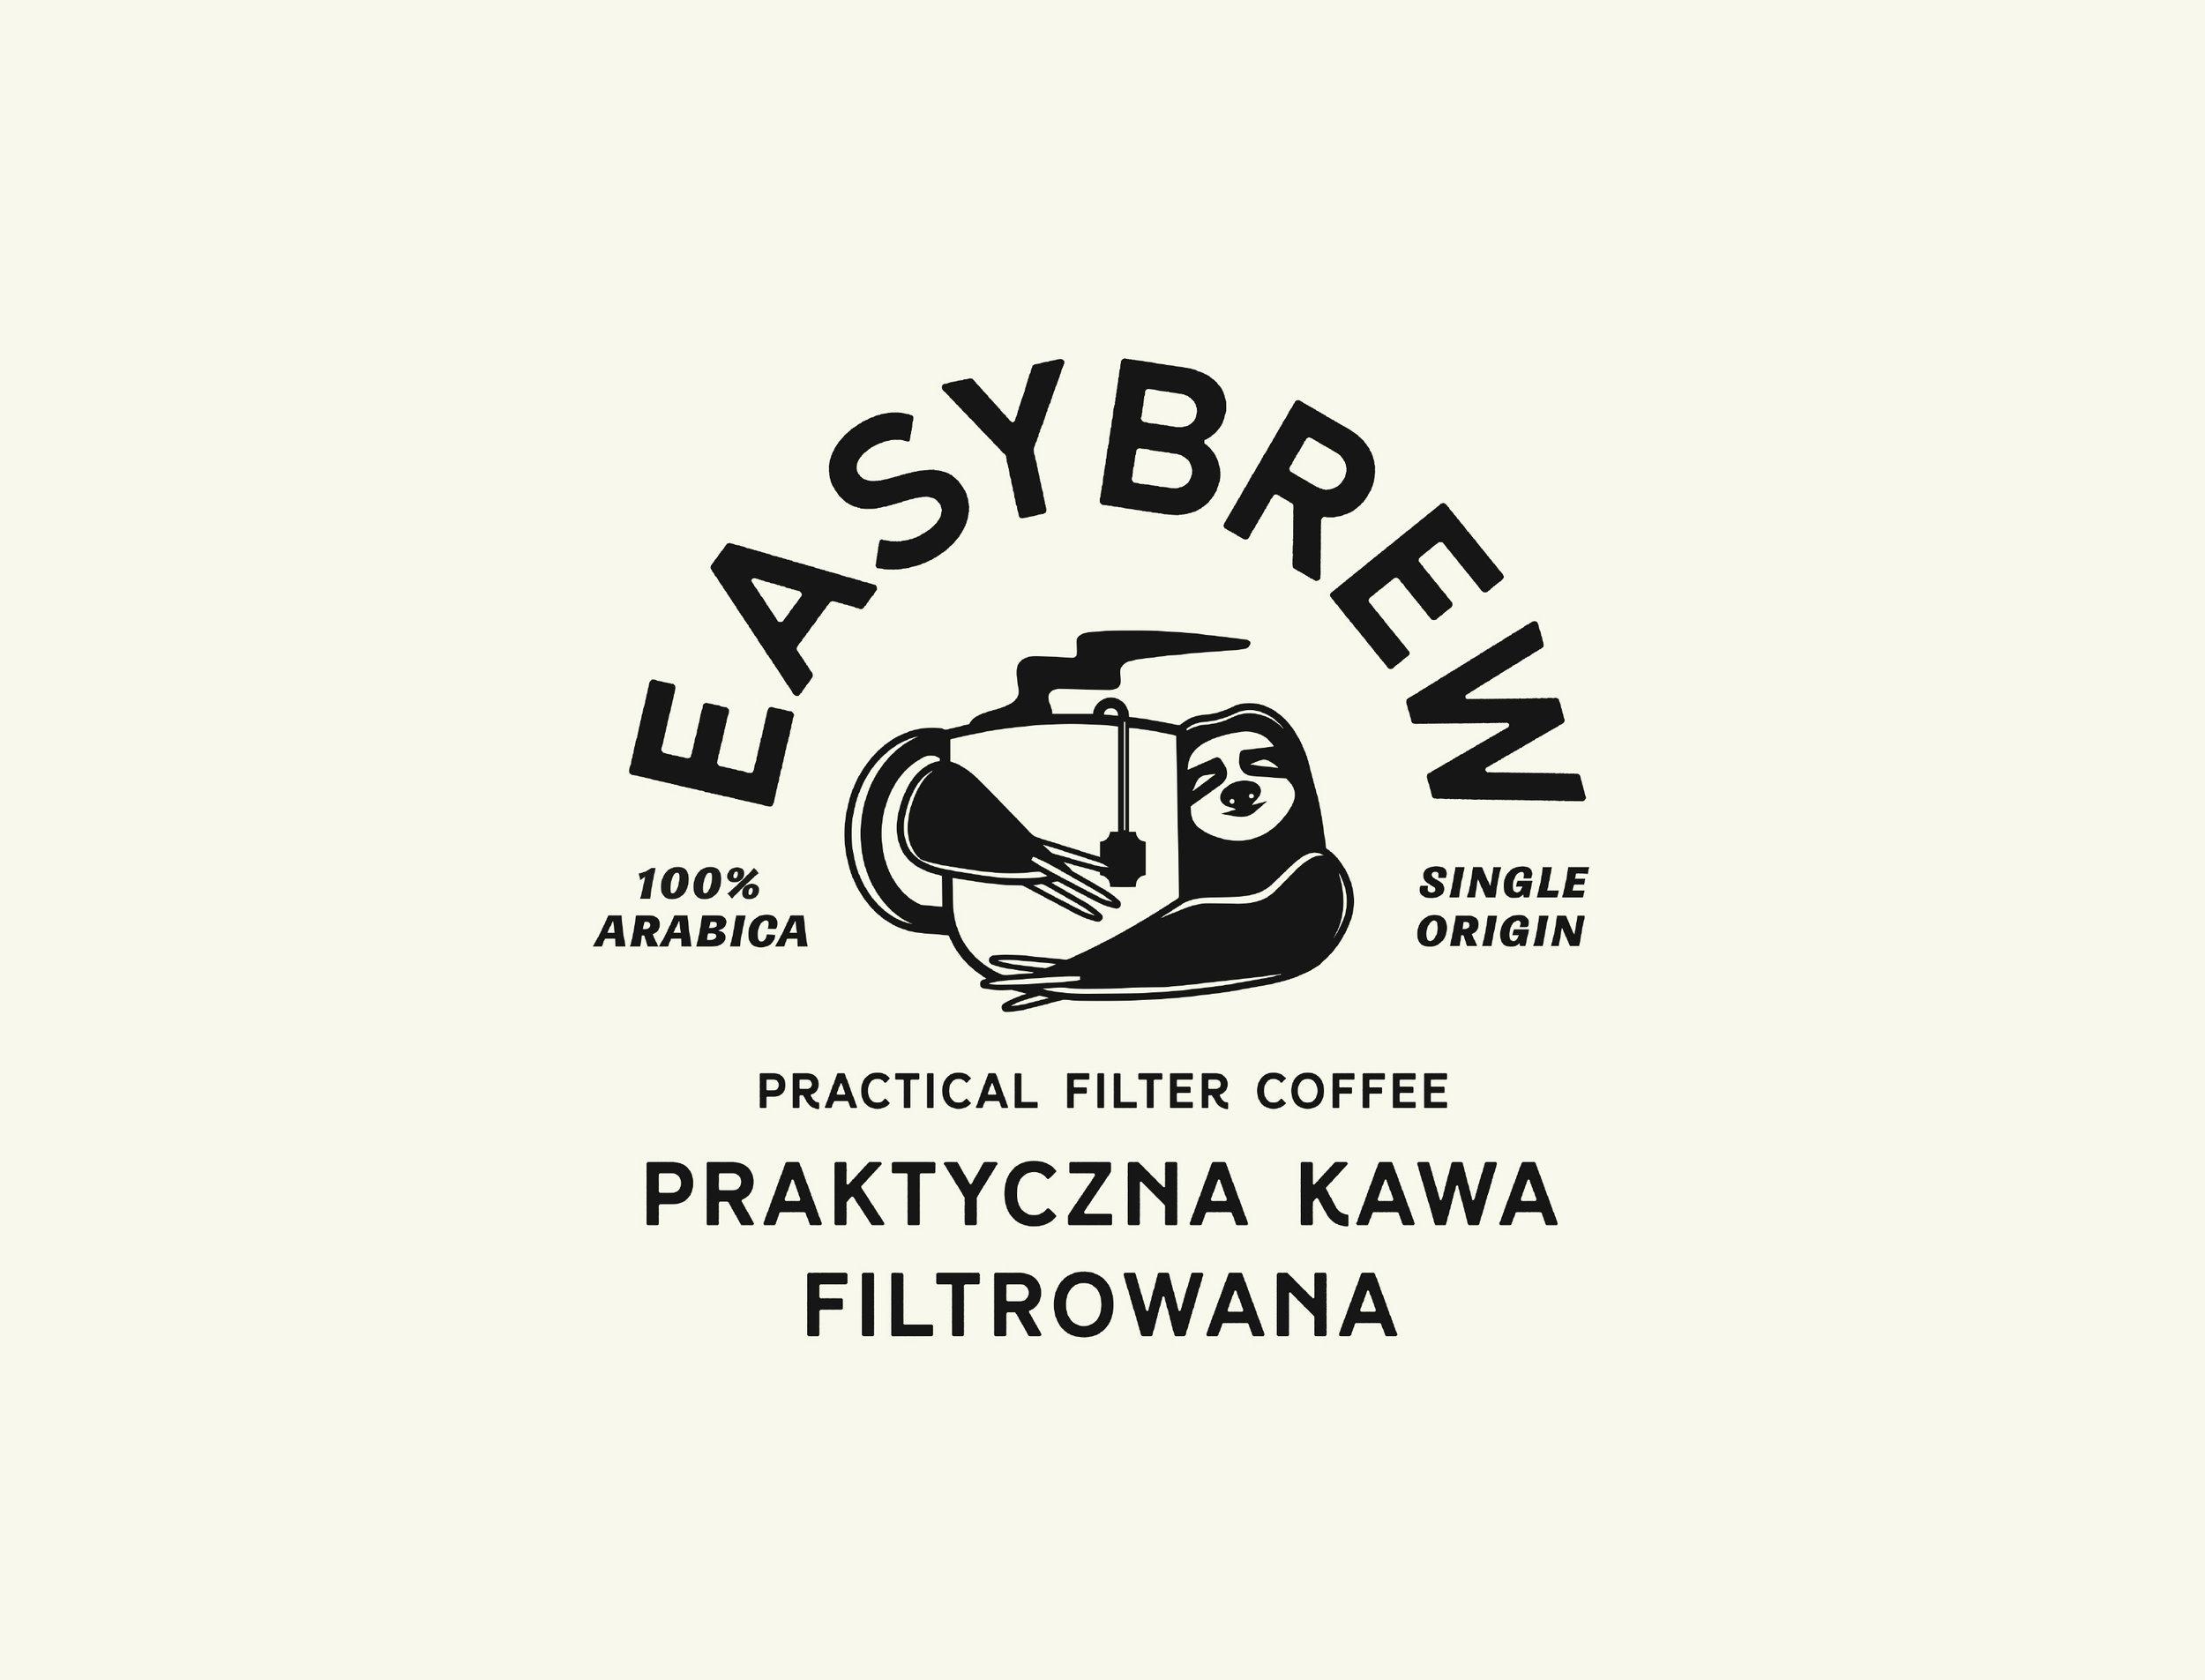 Zeki Michael Design - EasyBrew Coffee7.jpg